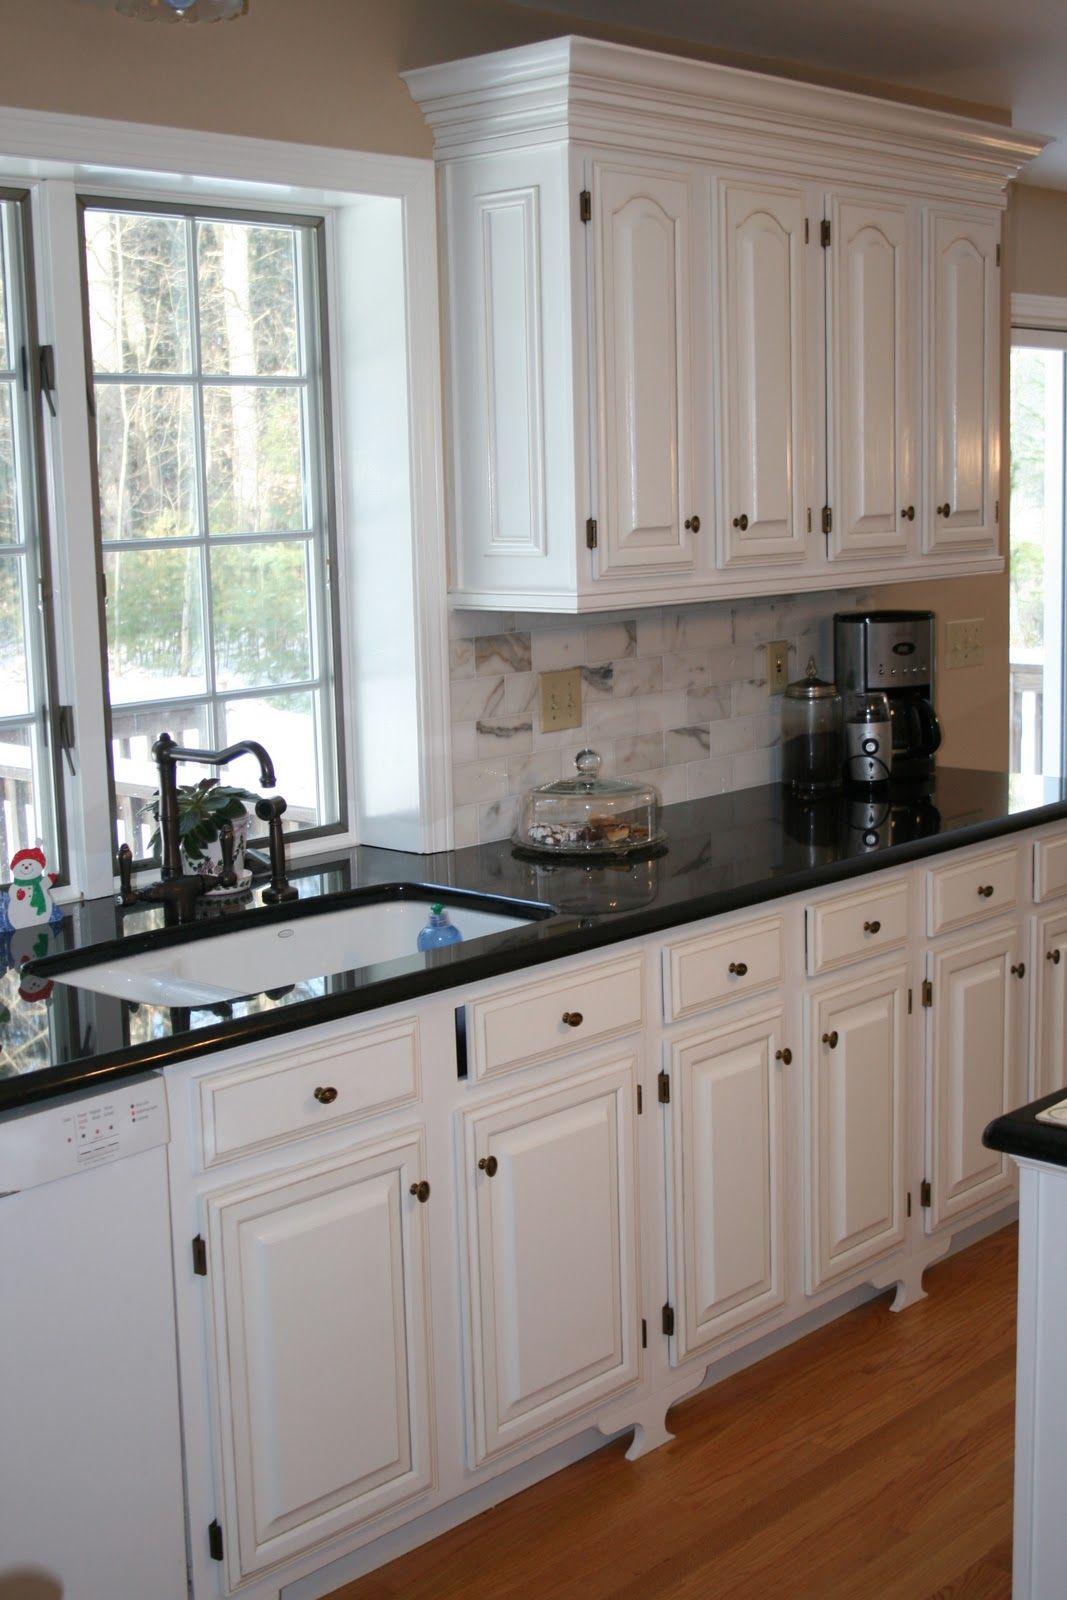 20 Fancy Design Ideas For Black And White Kitchen Black Kitchen